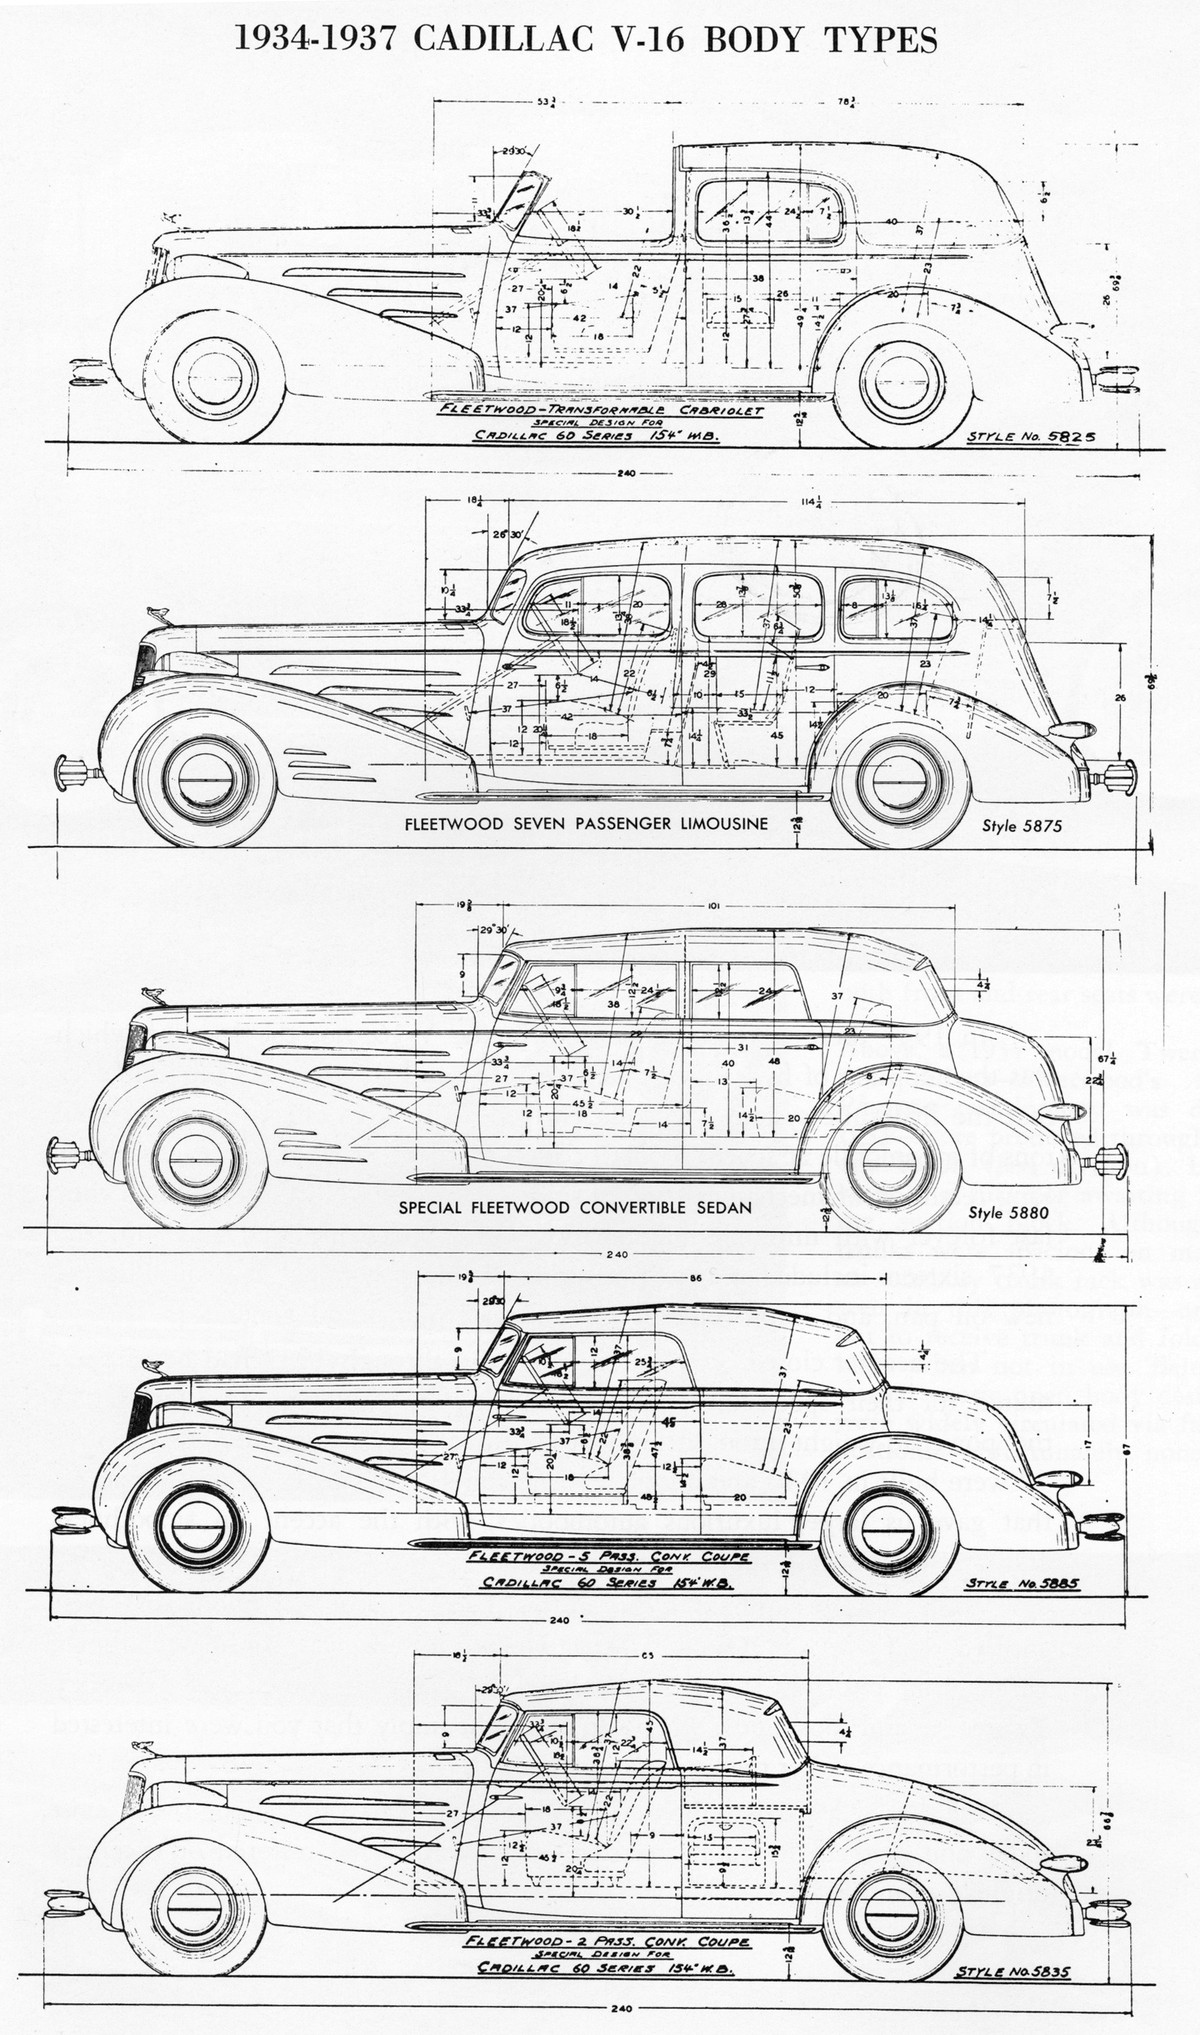 Cadillac V-16 blueprint